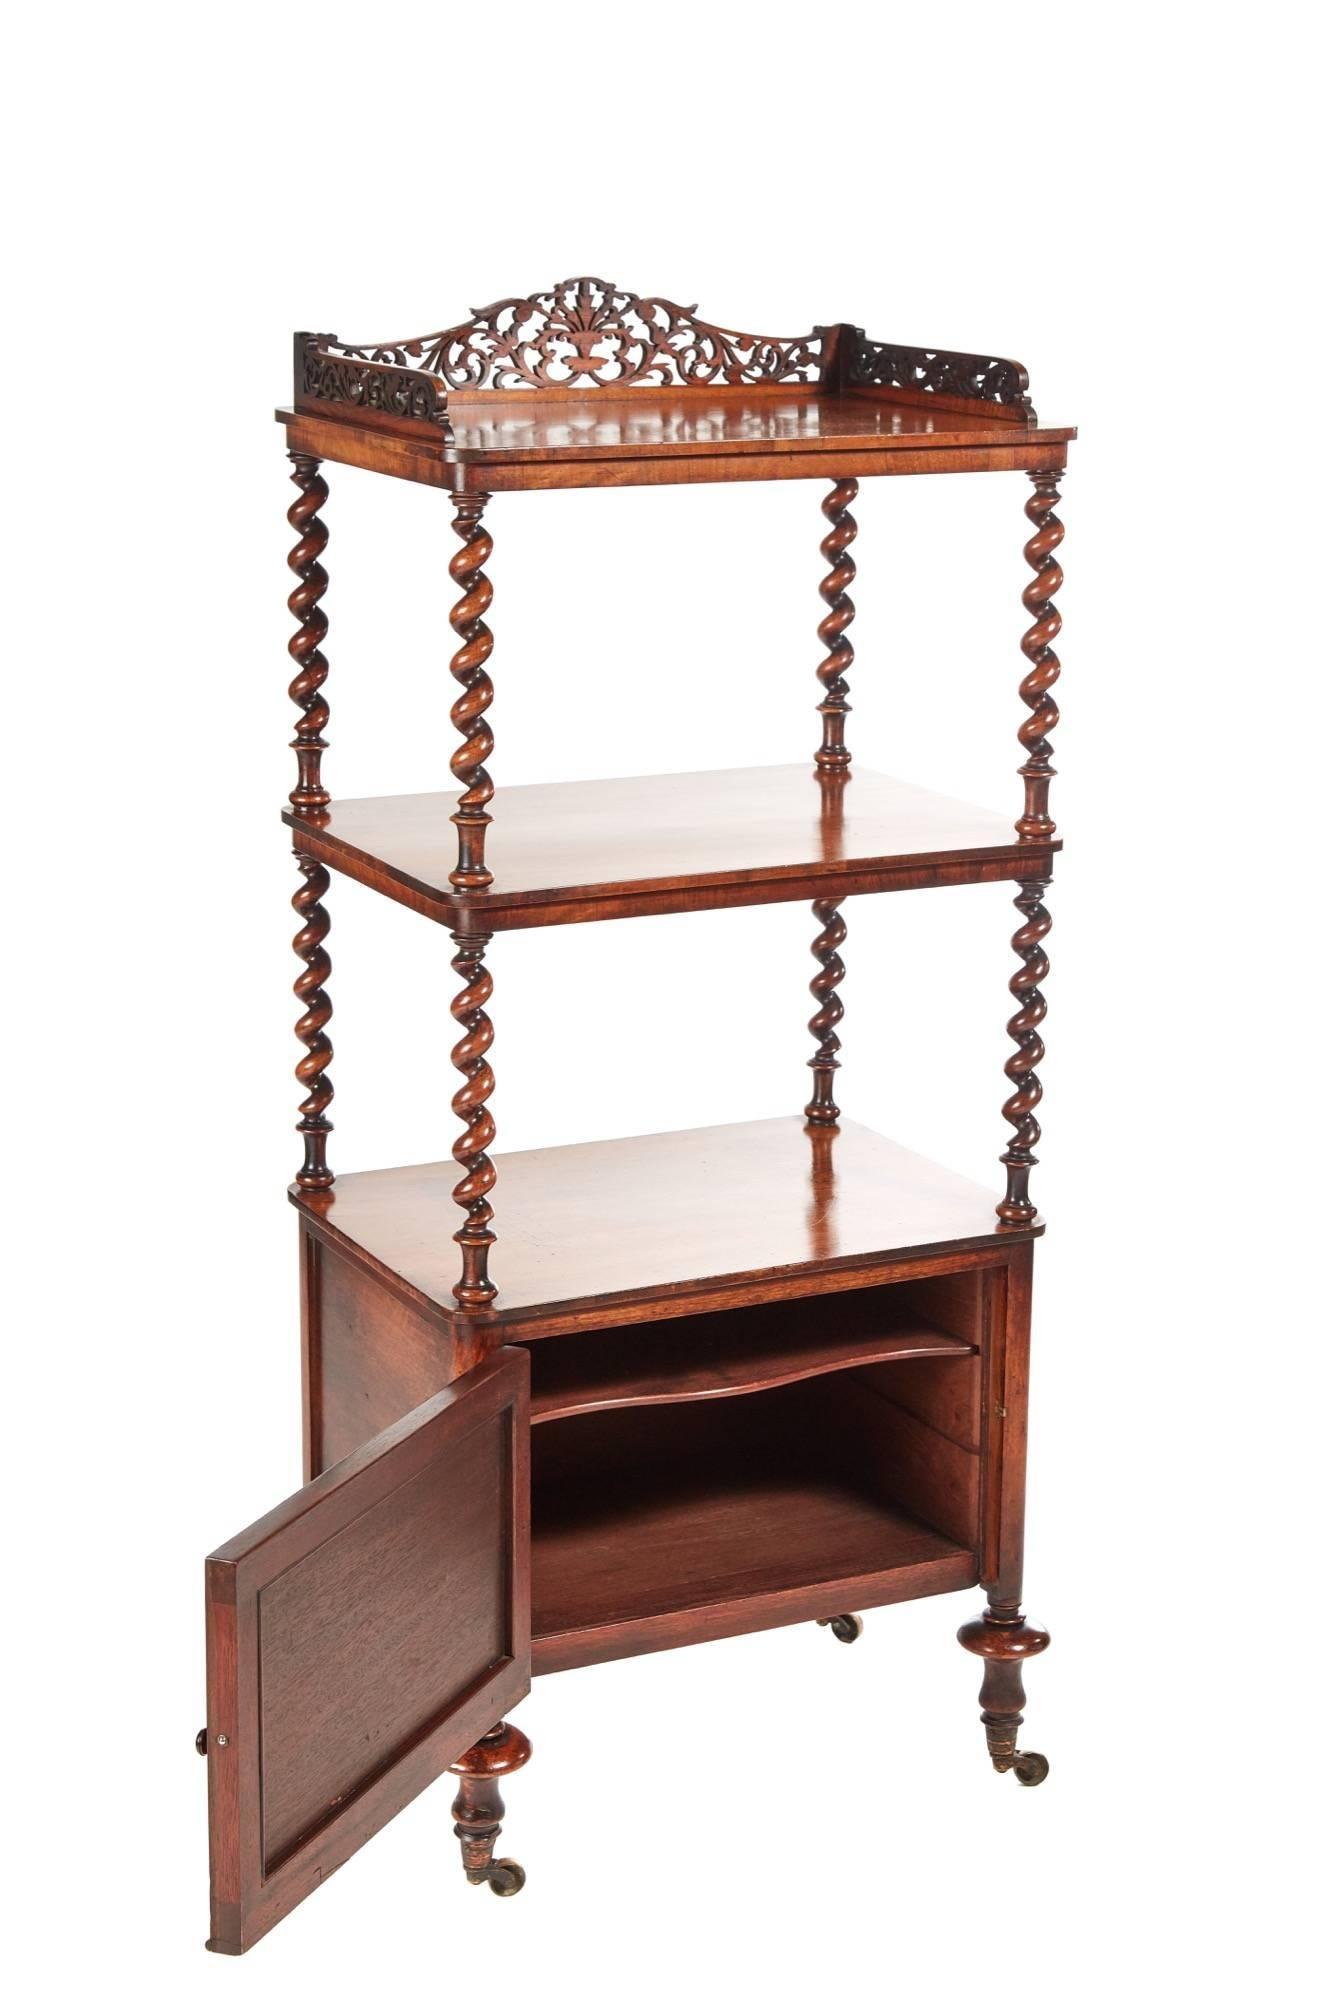 Merveilleux Victorian Burr Walnut Whatnot, The Top Having A Shaped Fretwork Gallery,  Lovely Walnut Shelves